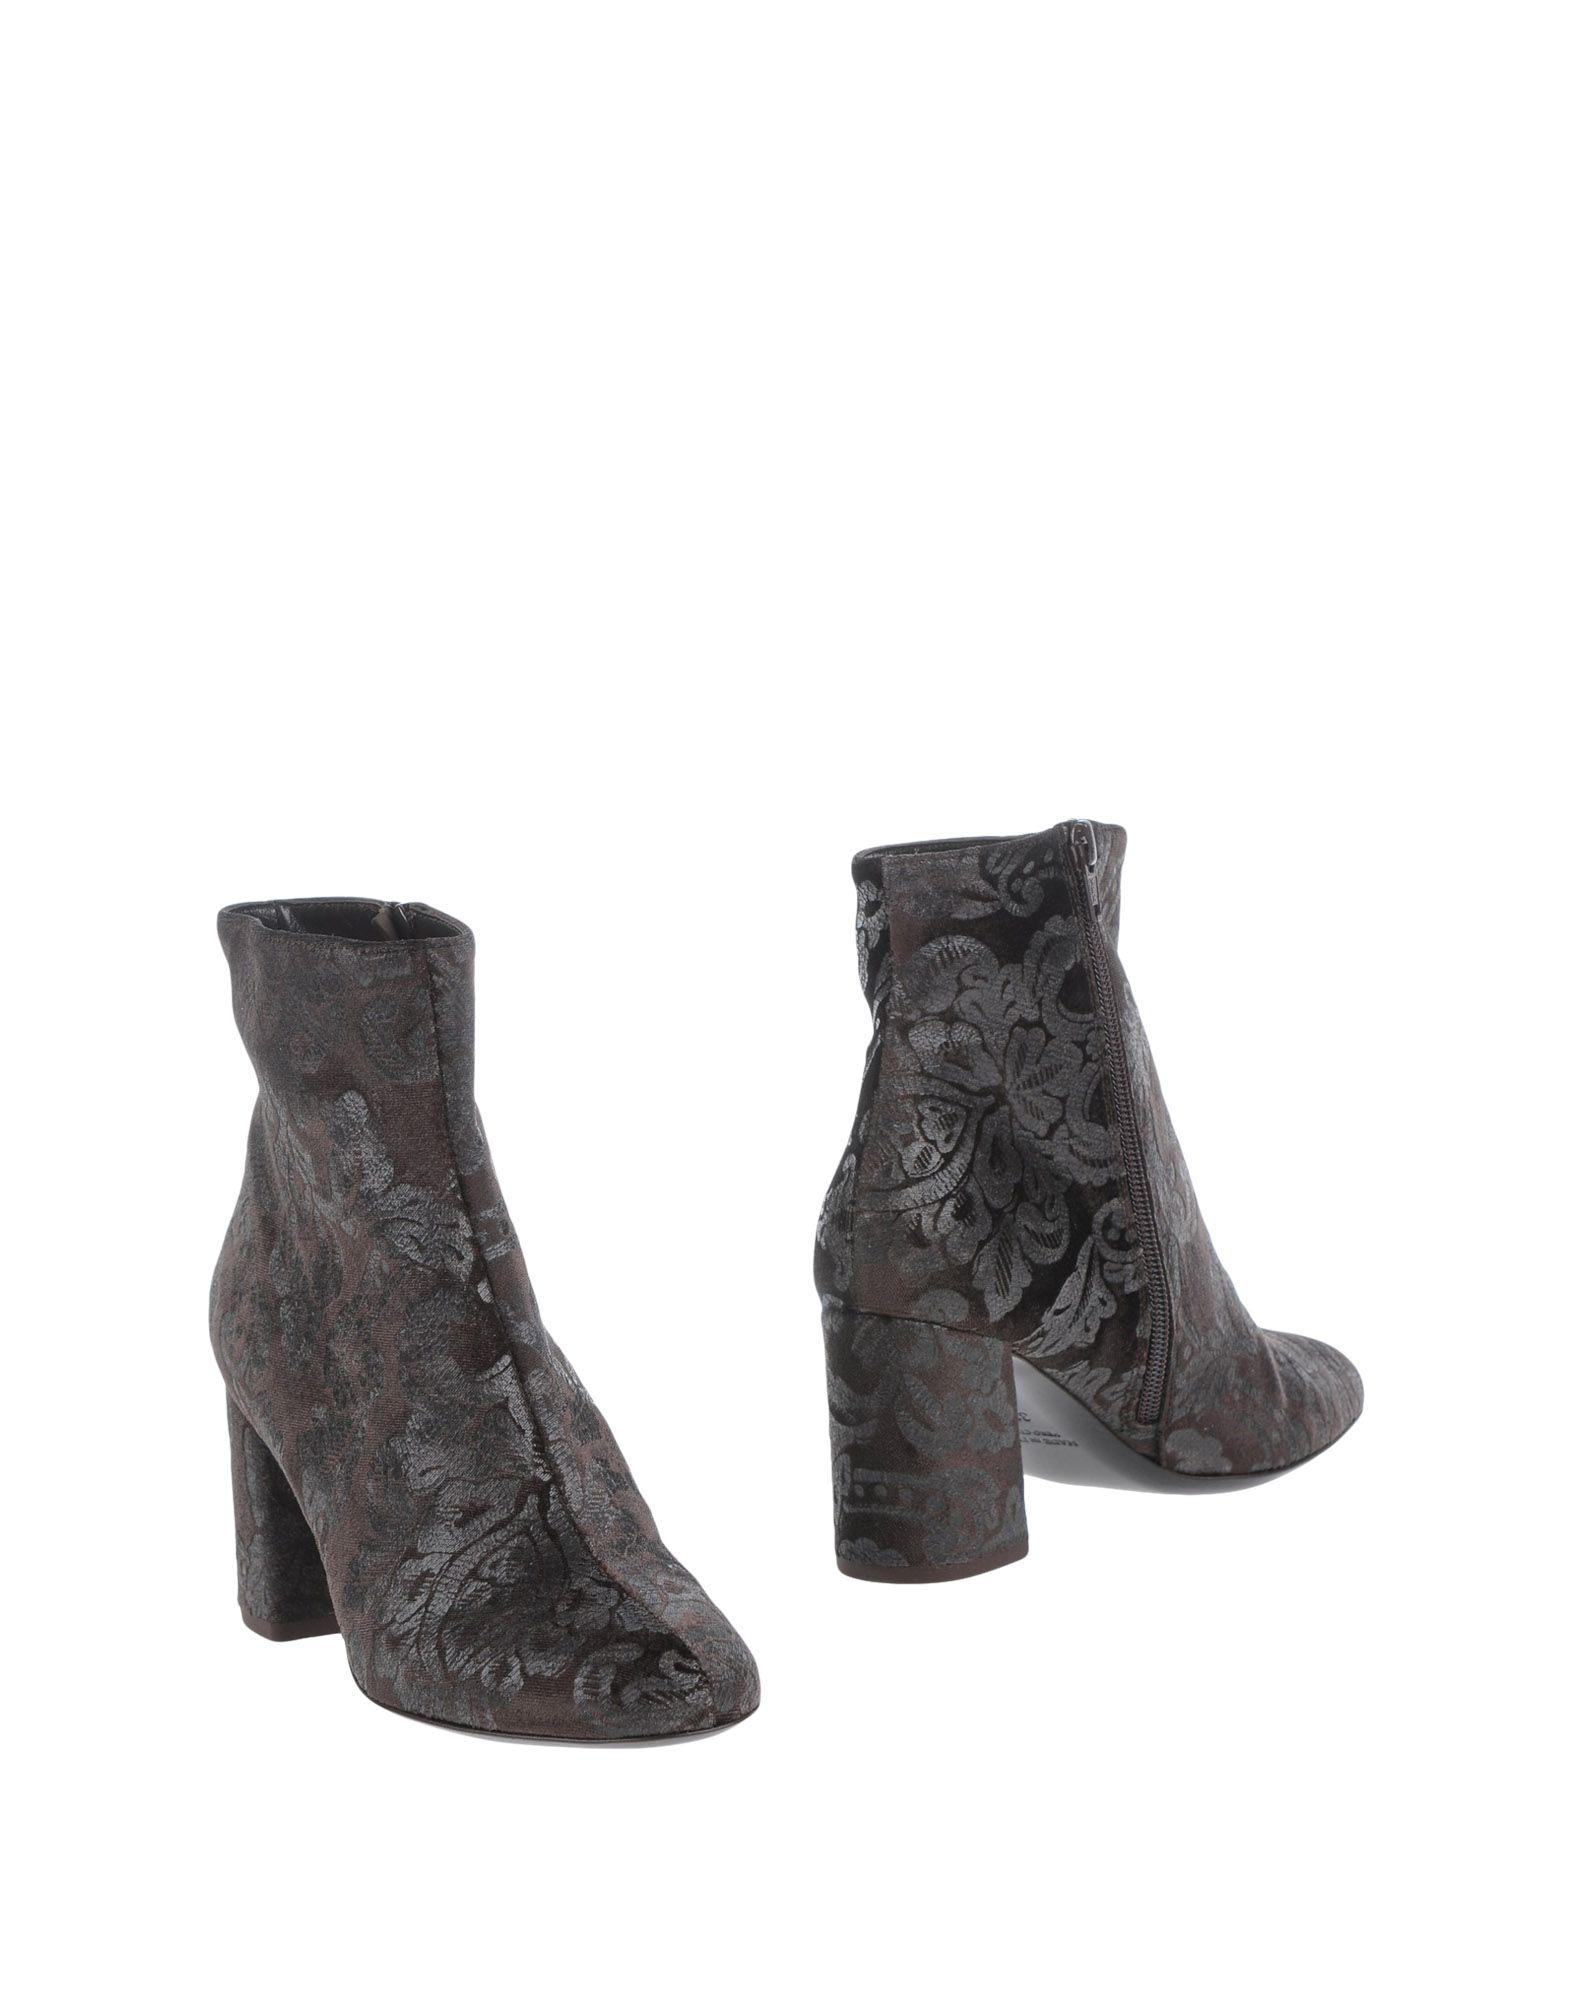 Andrea Catini Stiefelette Damen  11321705BA Gute Qualität beliebte Schuhe